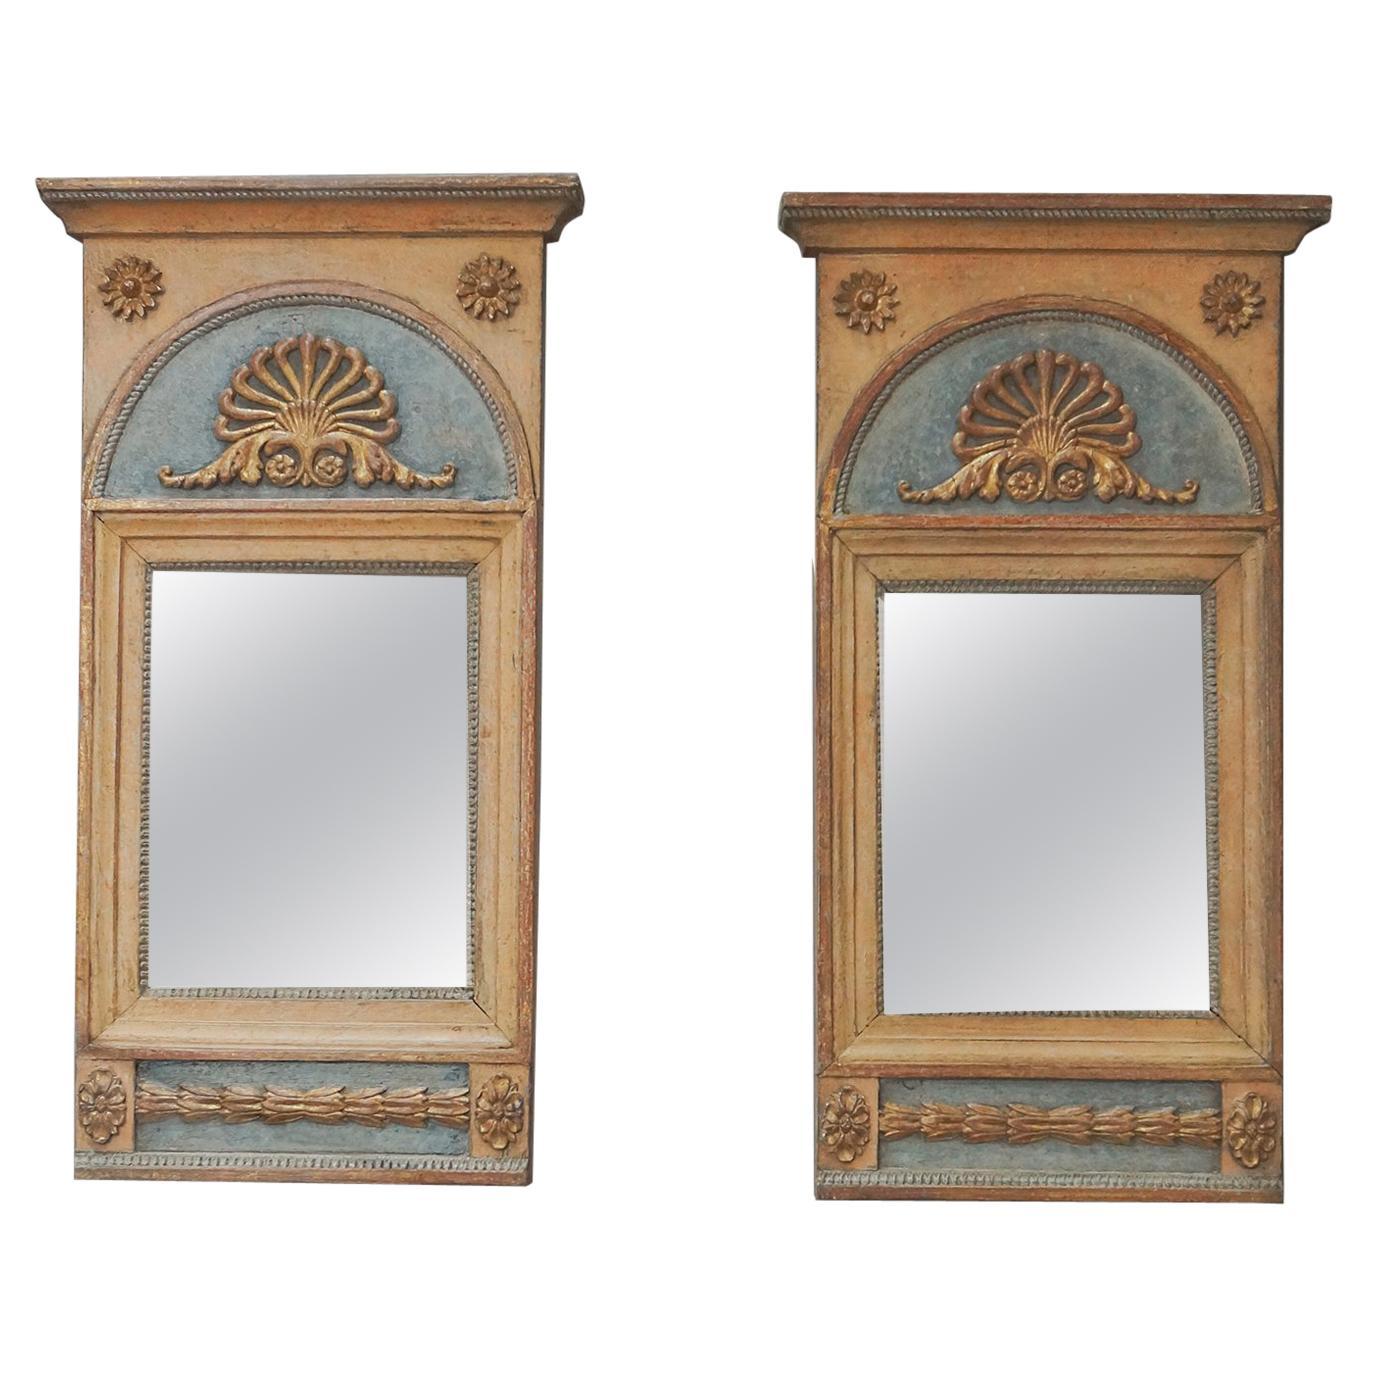 Pair of Period Gustavian Mirrors